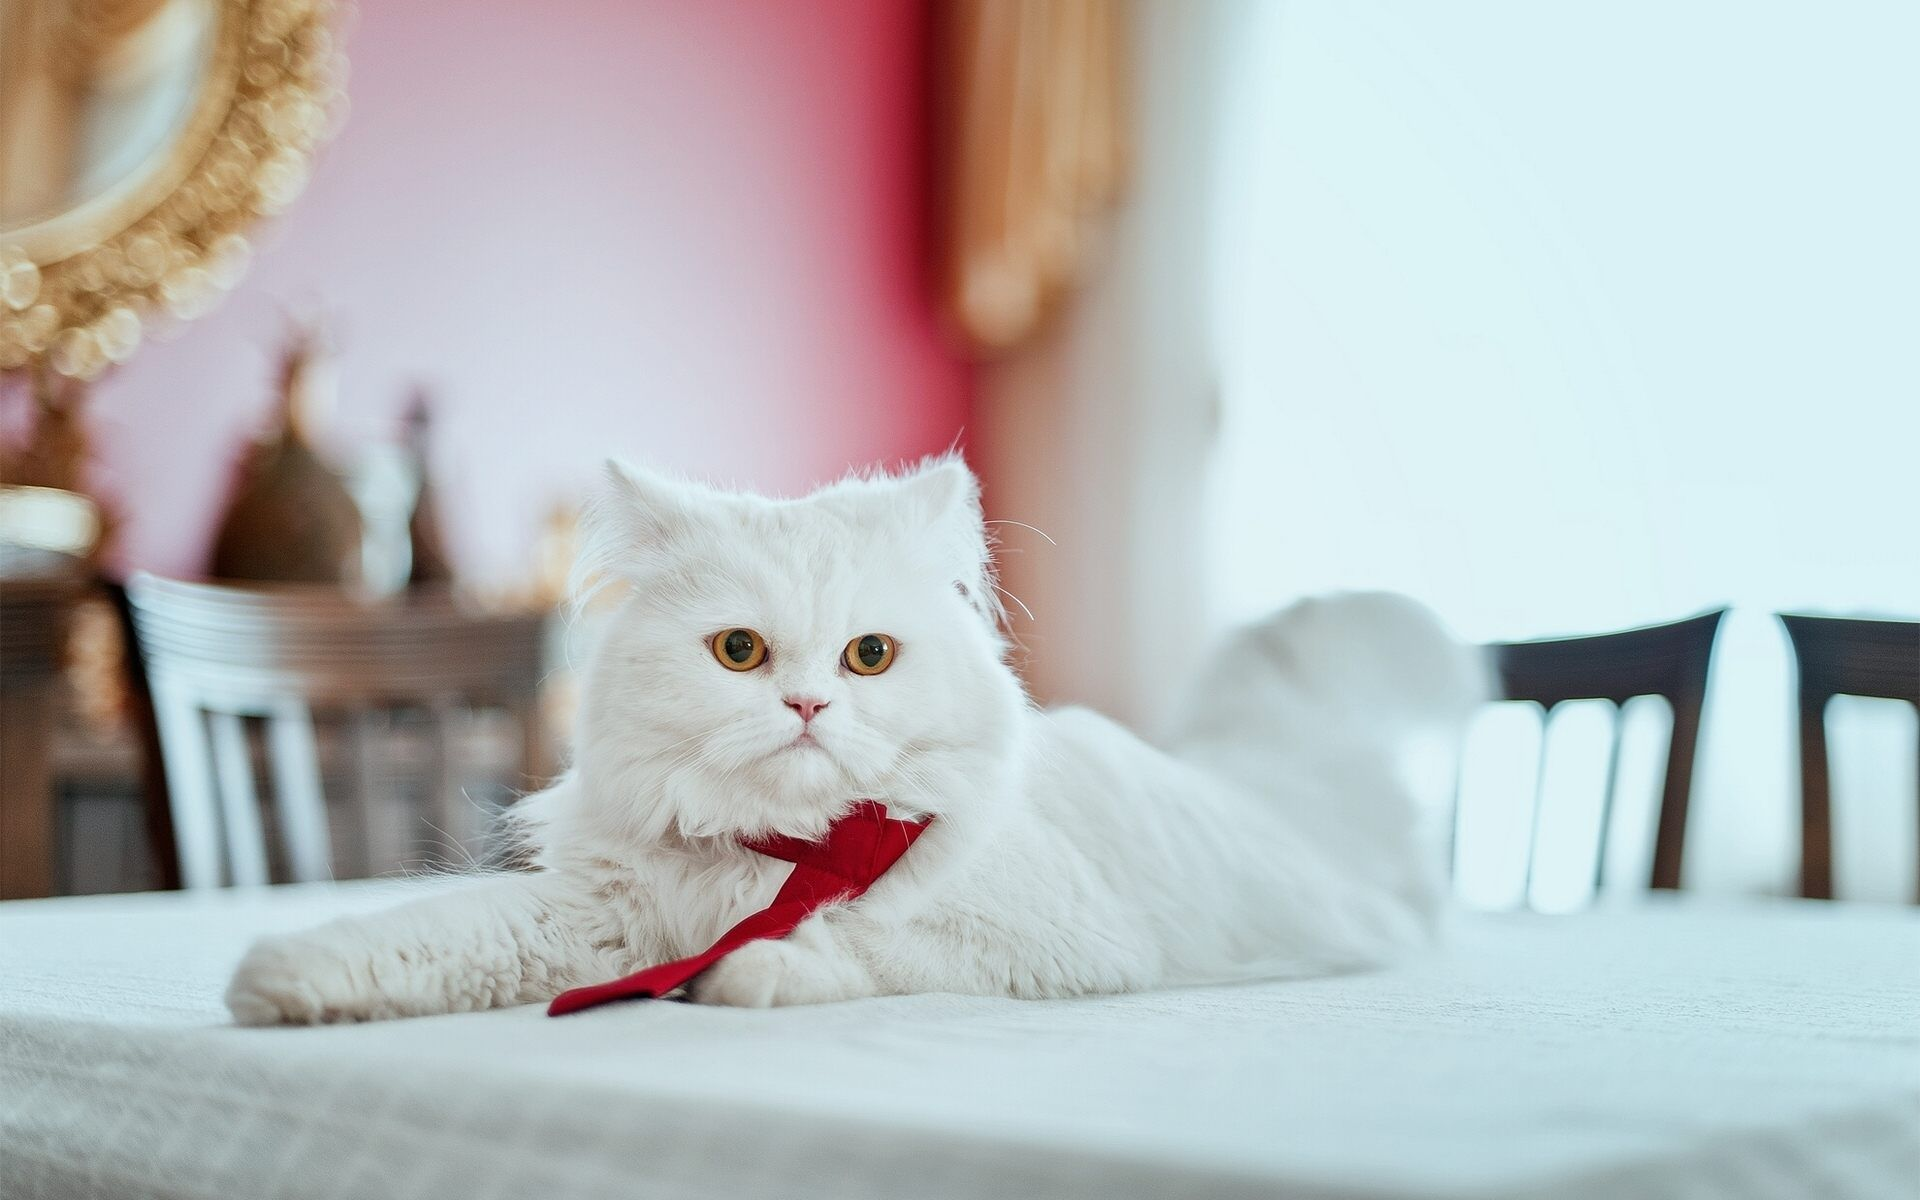 Hd wallpaper cat - Persian Cat Wallpapers Hd Download